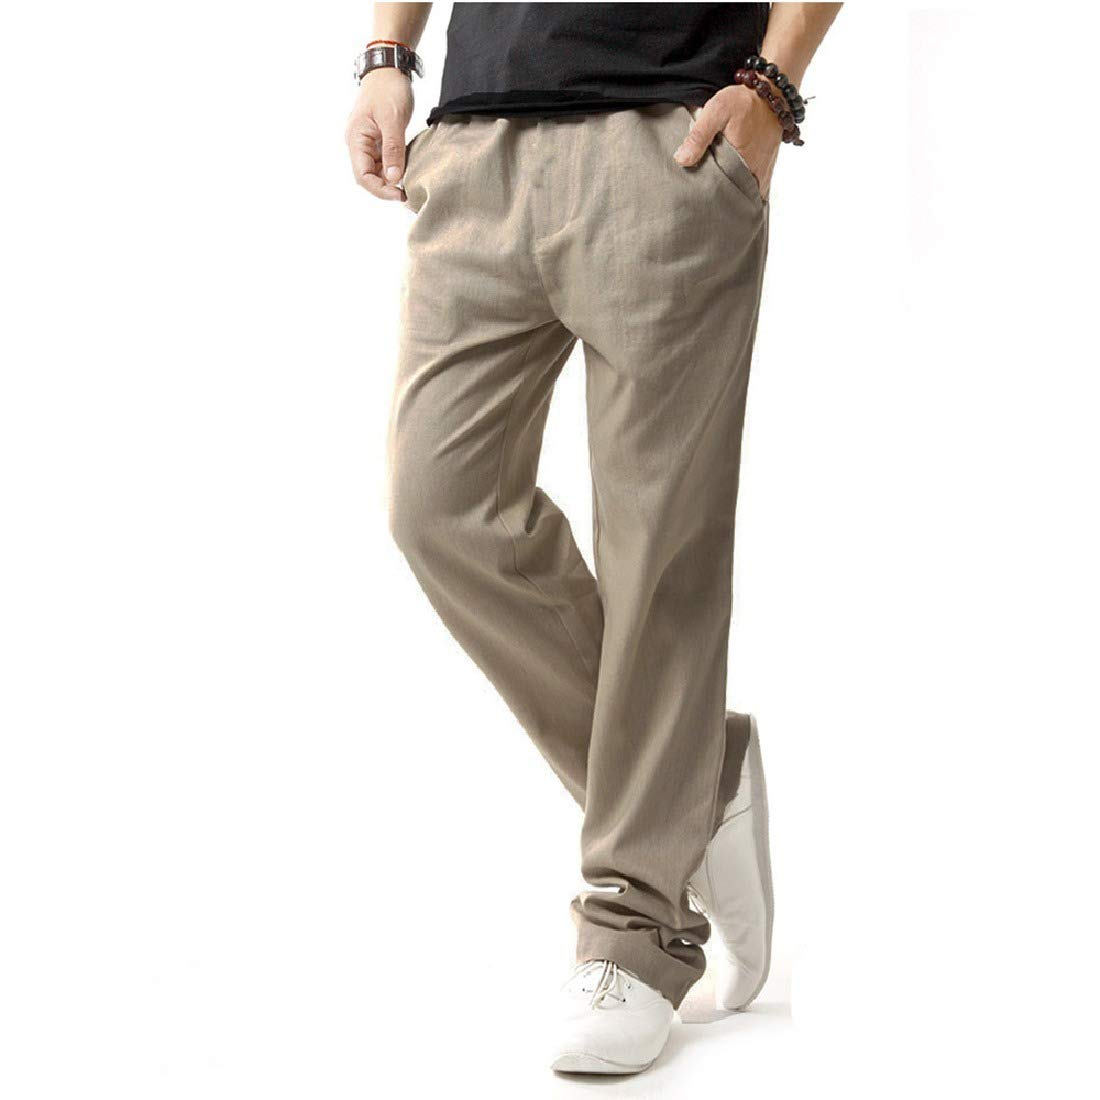 pipigo Mens Linen Beach Drawstring Casual Solid Color Straight Leg Loose Fit Pants Beige XS